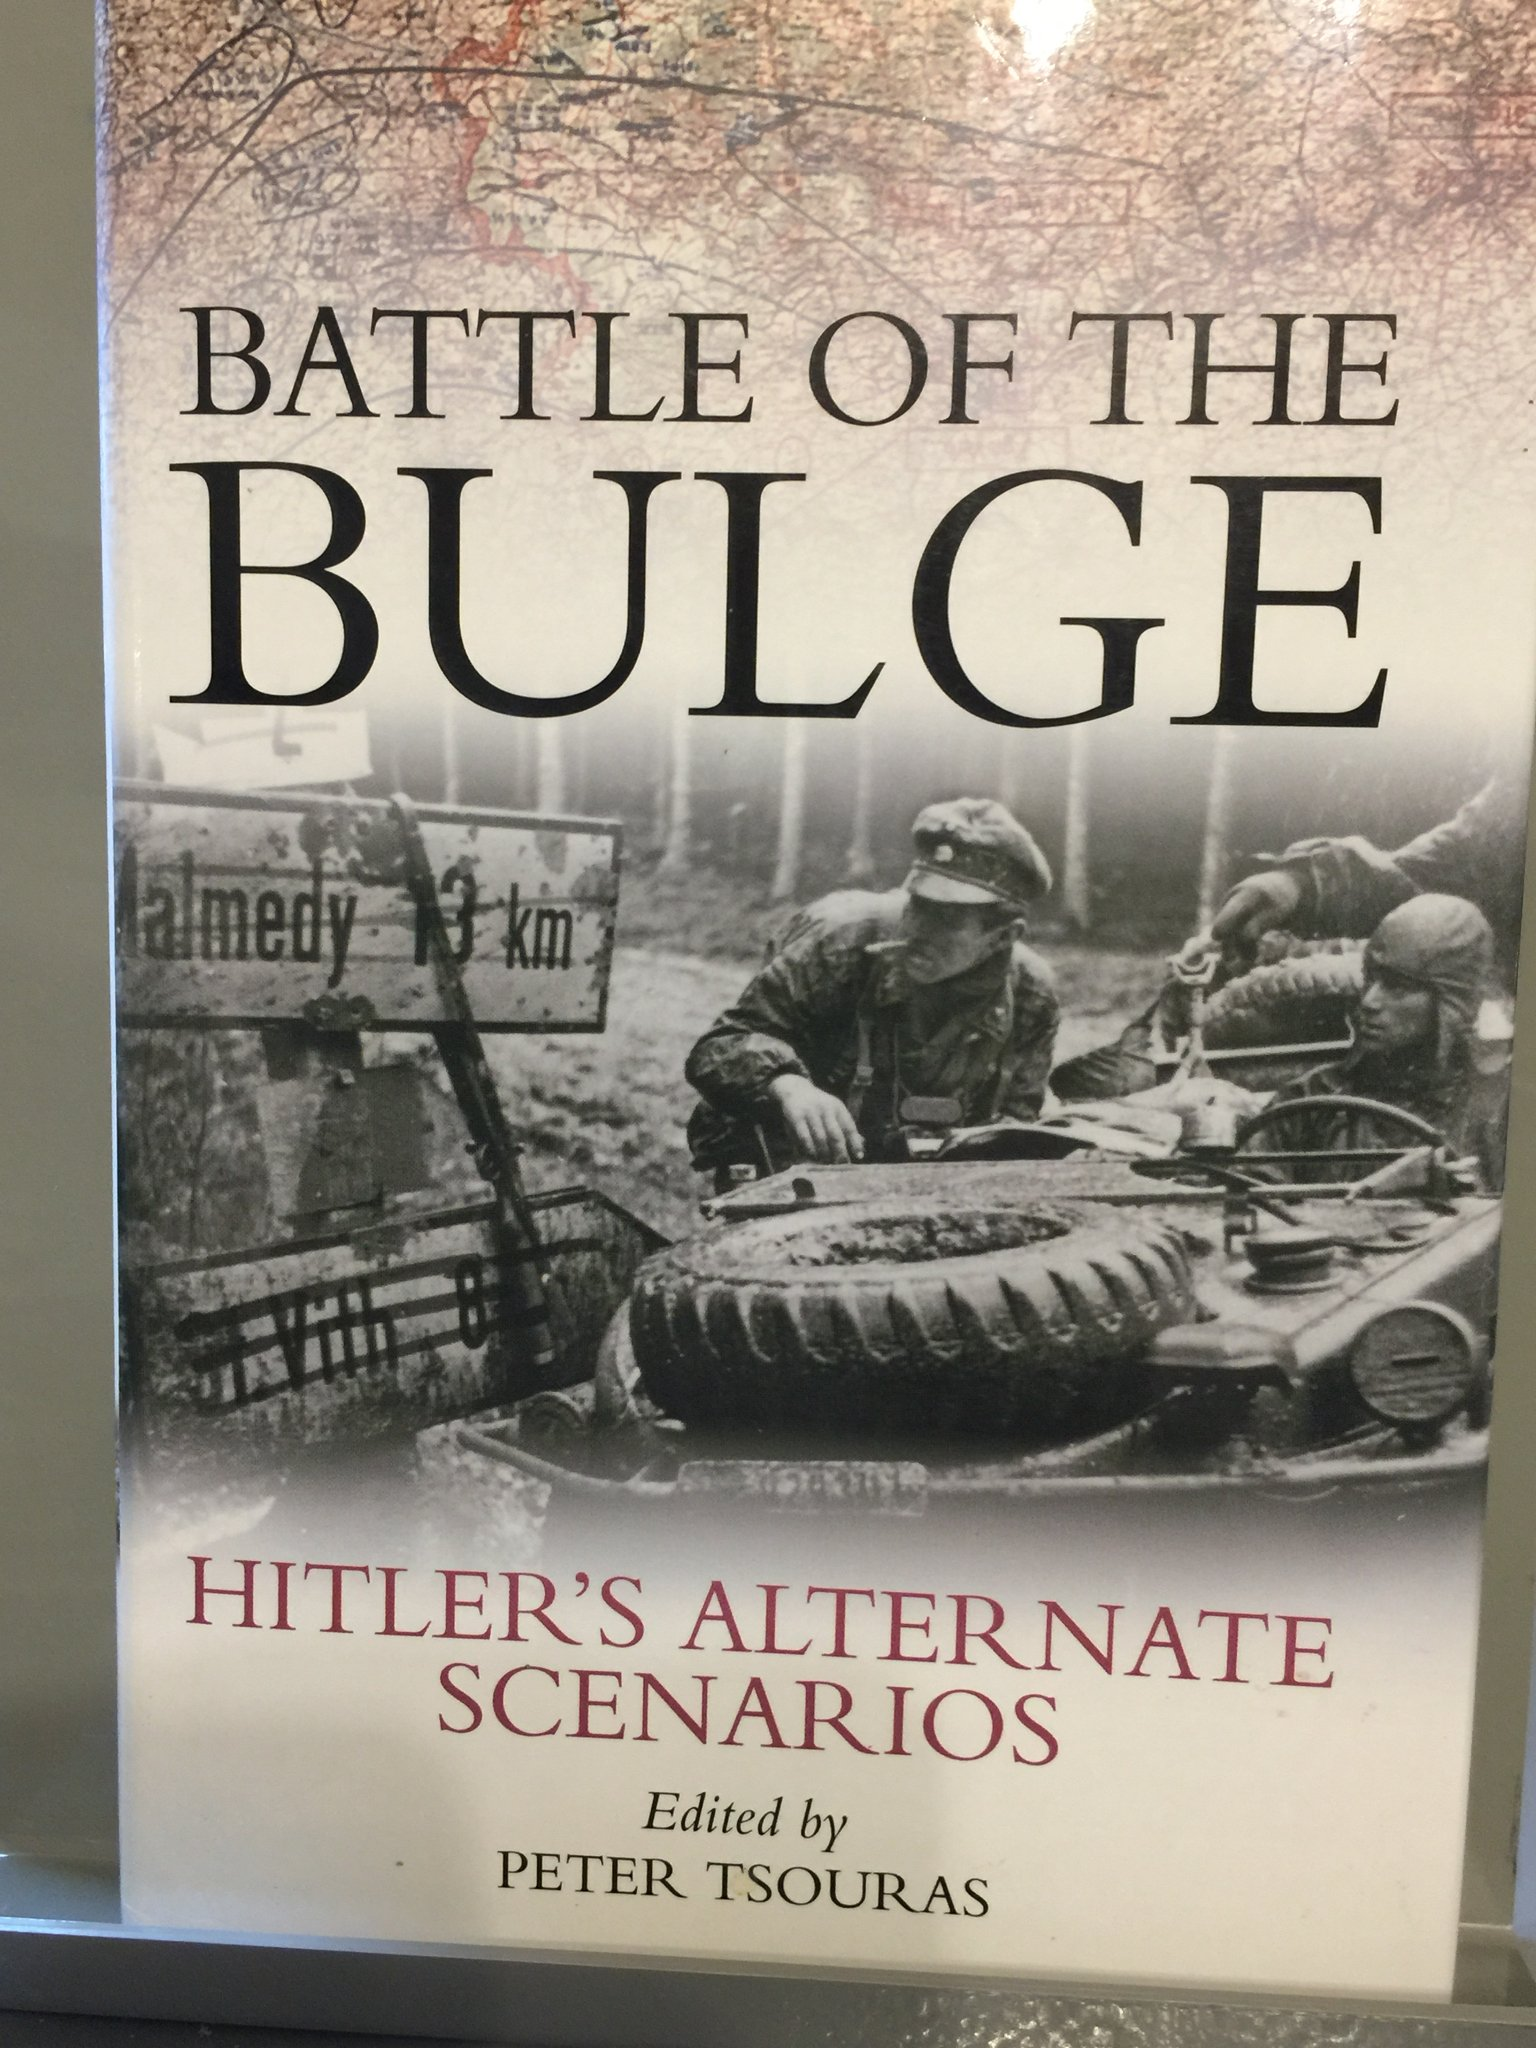 Battle of the Bulge: Hitler's Alternate Scenarios: Peter